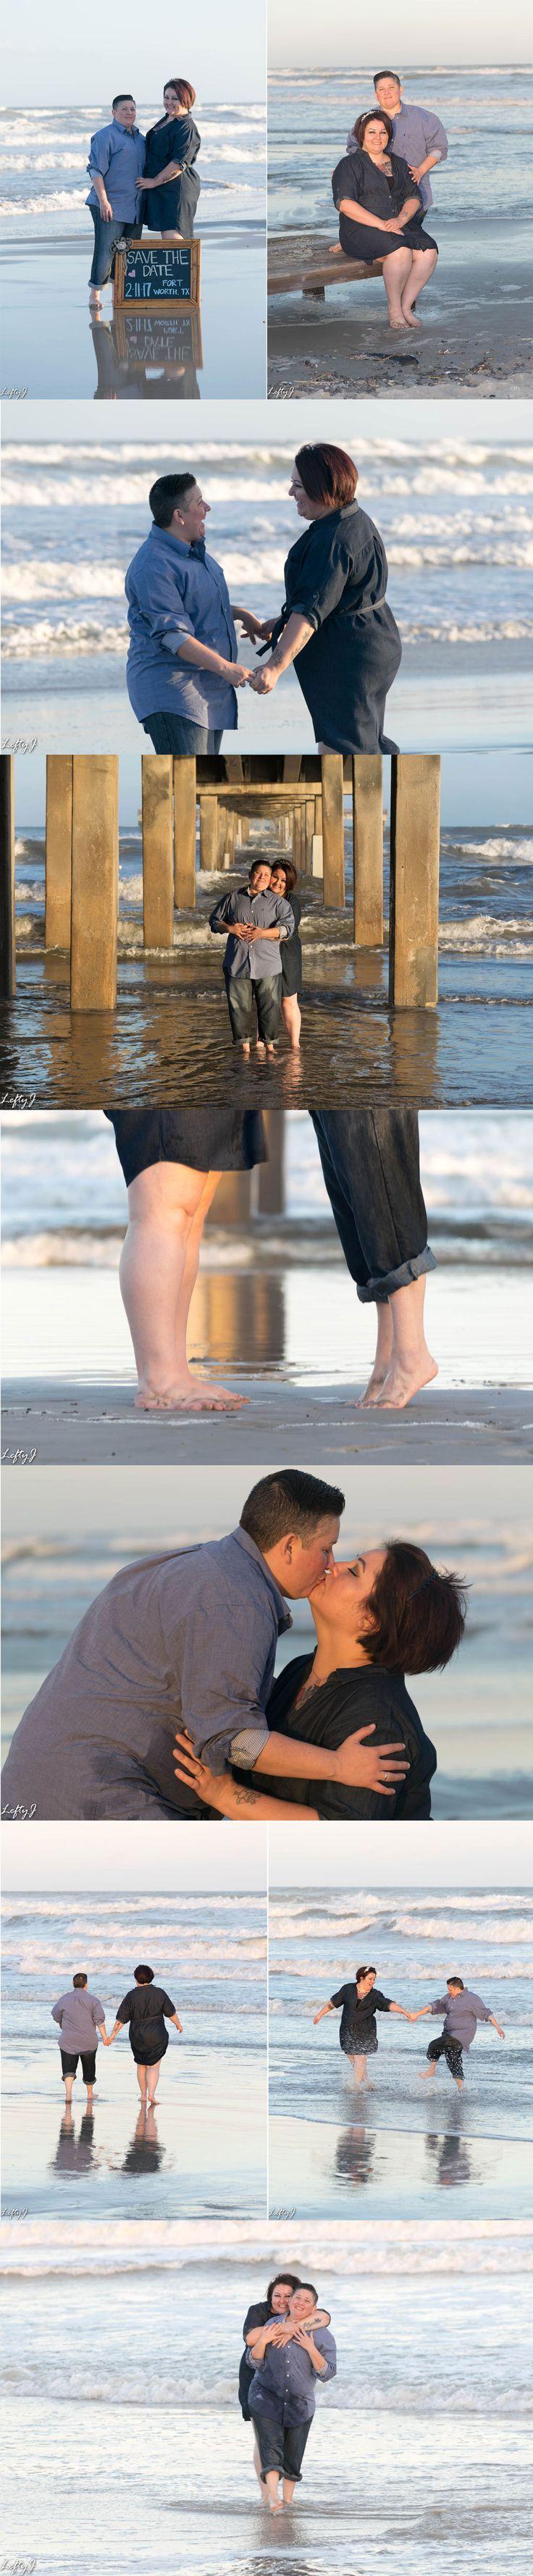 Laurie & Jenna engagement - Corpus Christi, TX #engagementphotos #savethedate #beachphotos #love #corpuschristiphotography #corpuschristiphotographer